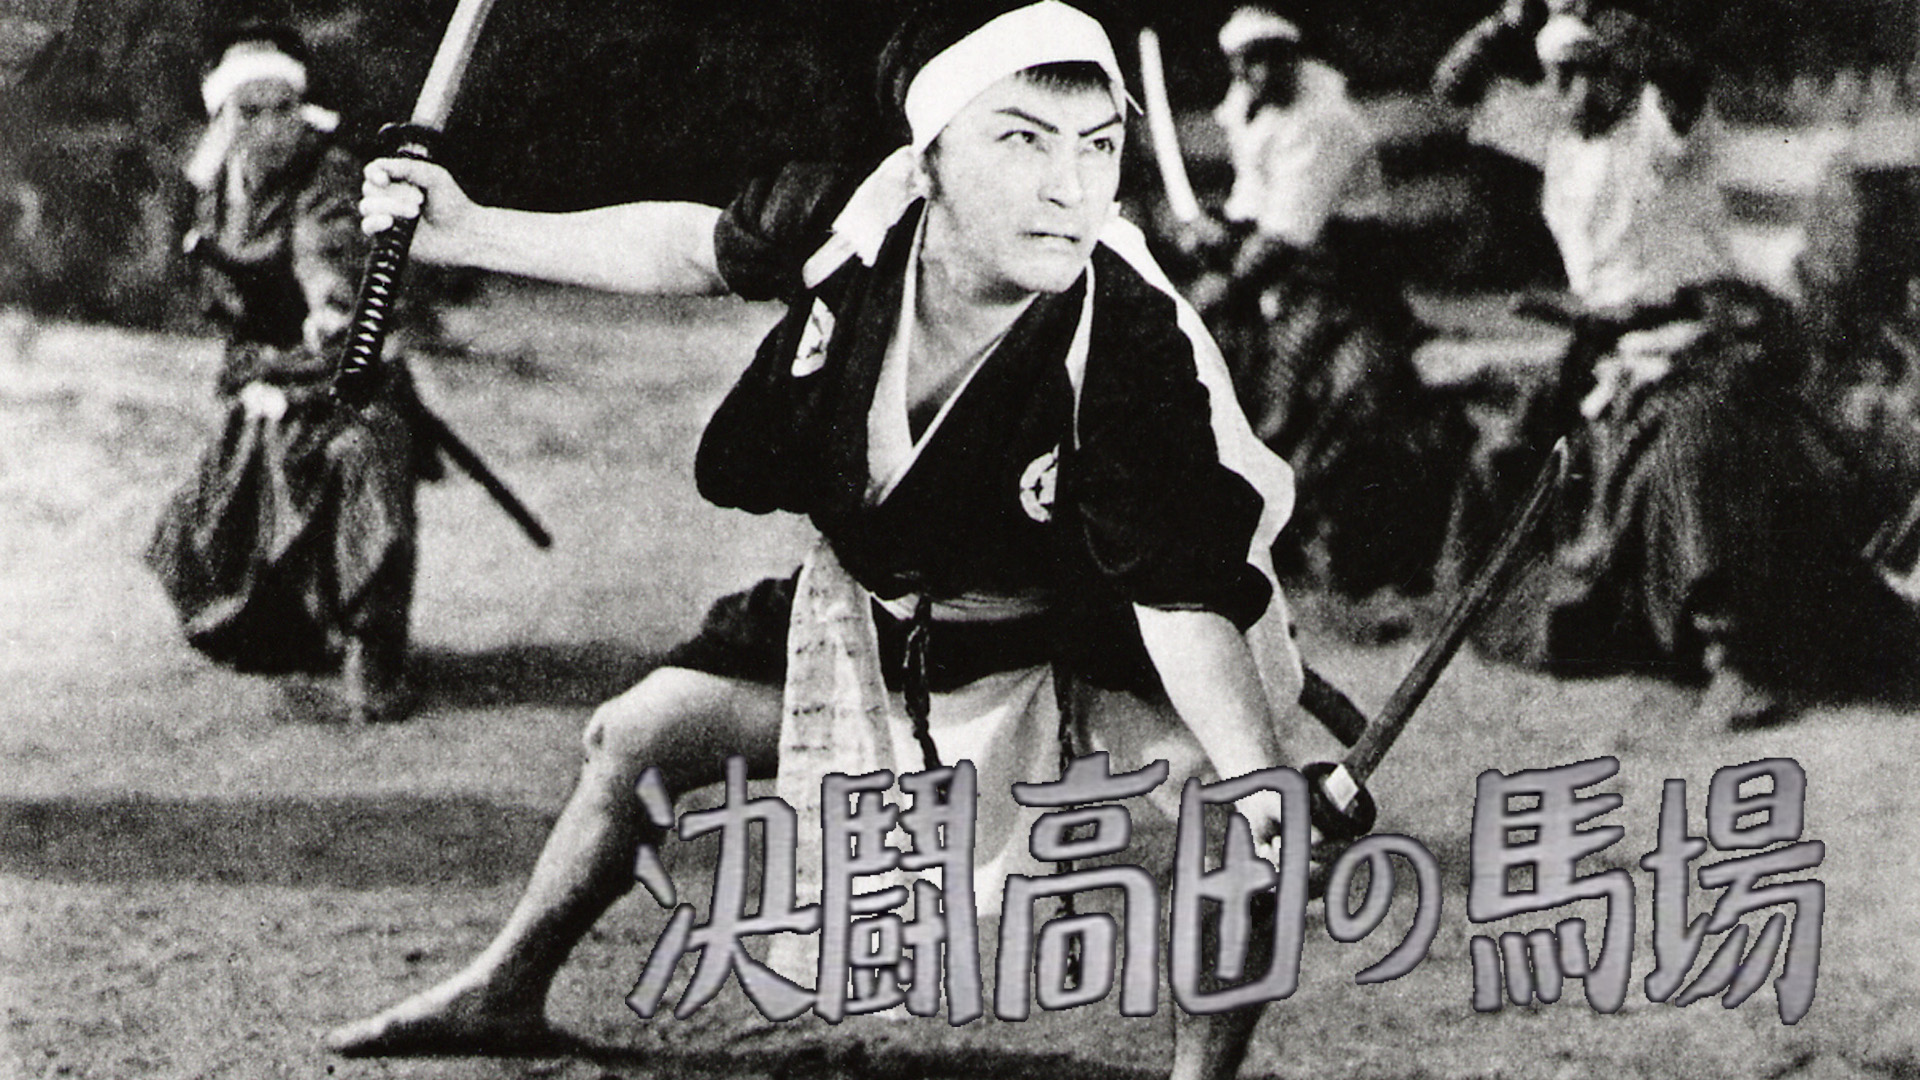 血煙高田の馬場(戦後改題「決闘高田の馬場」)